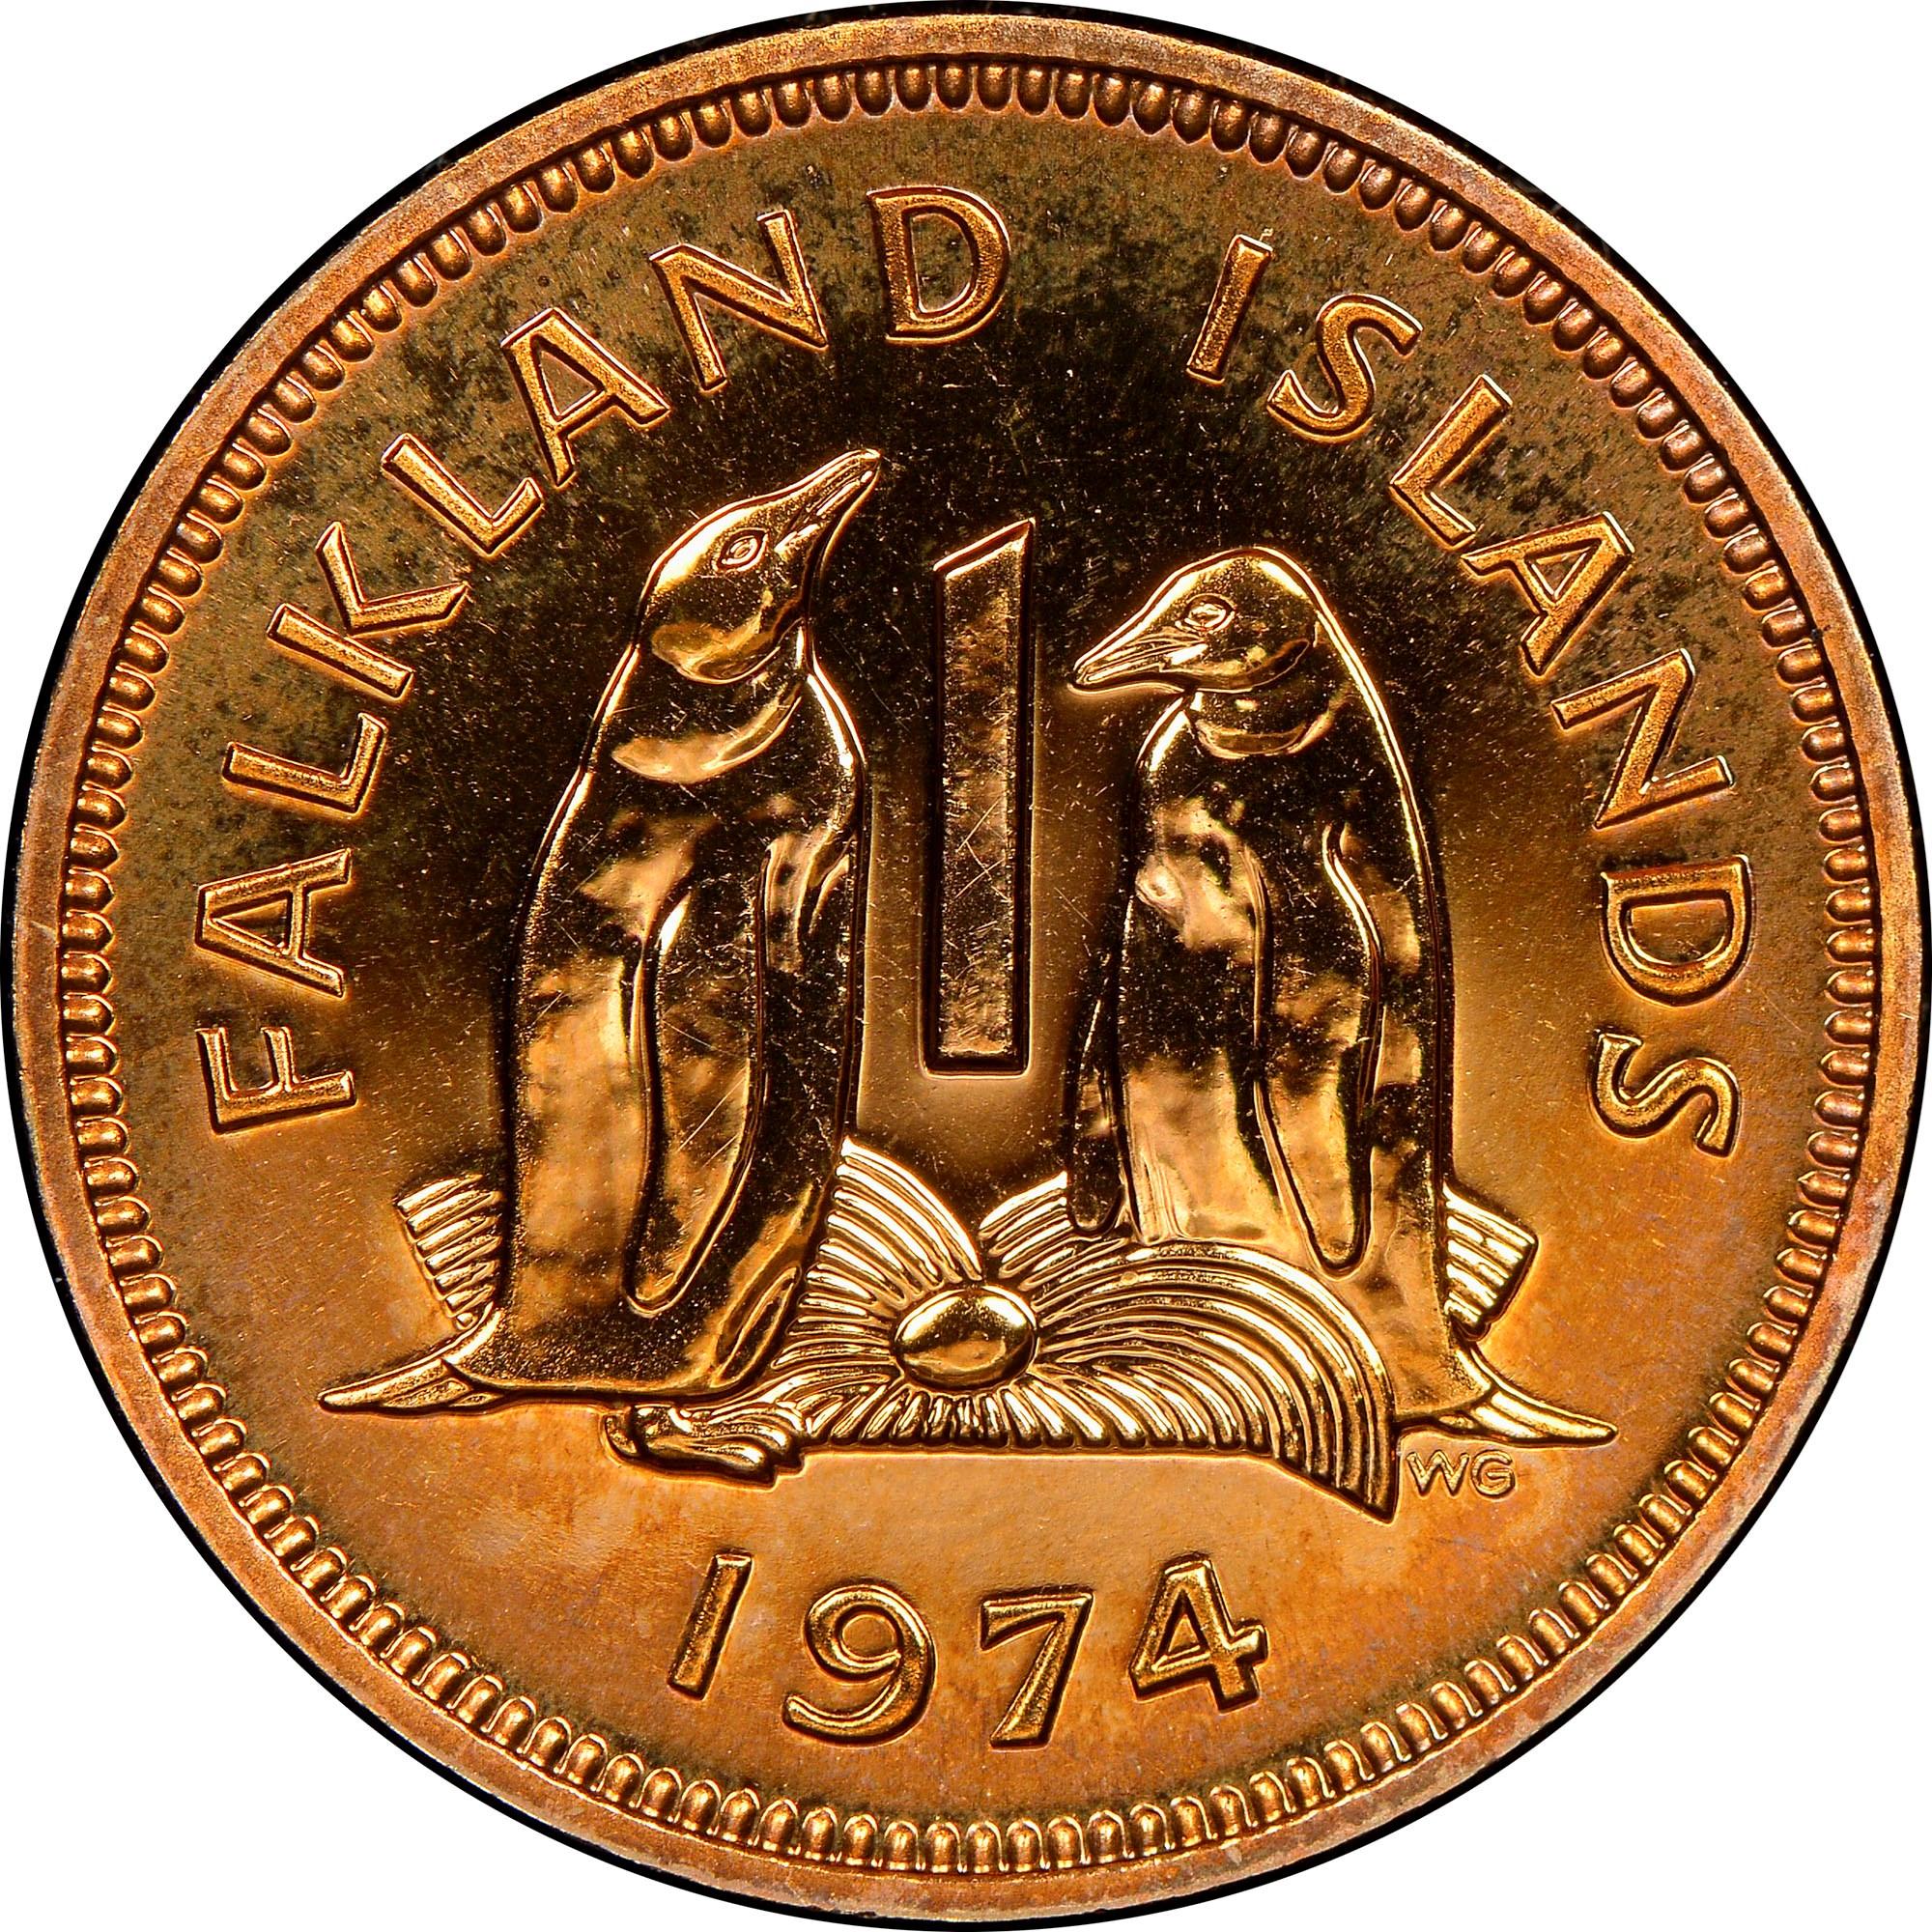 Falkland Islands Penny reverse